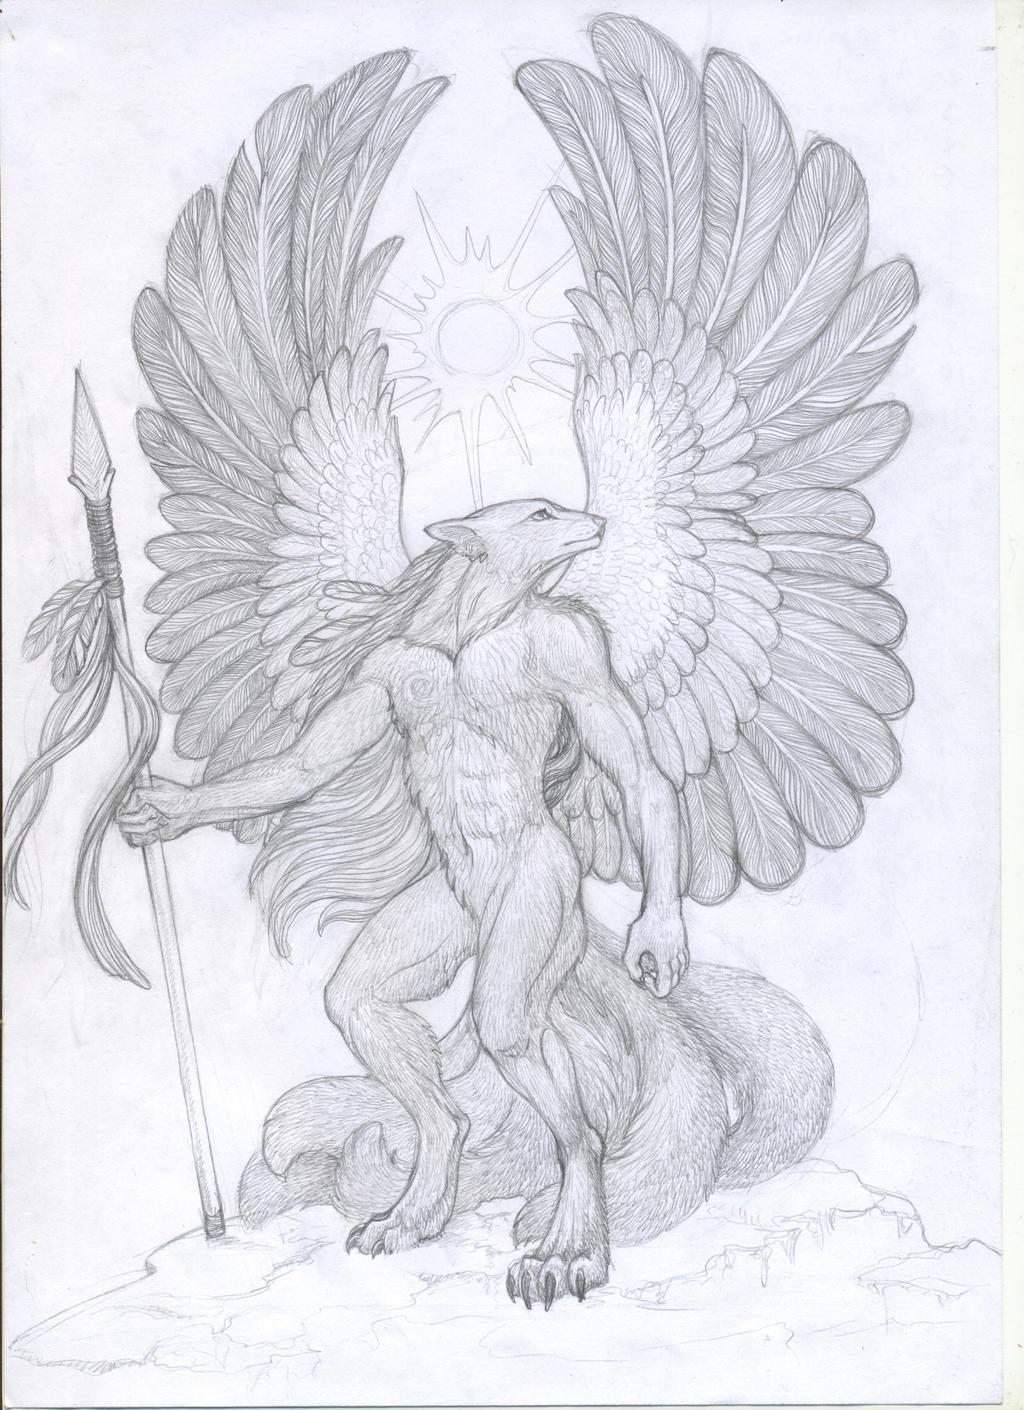 Kitsune warrior sketch